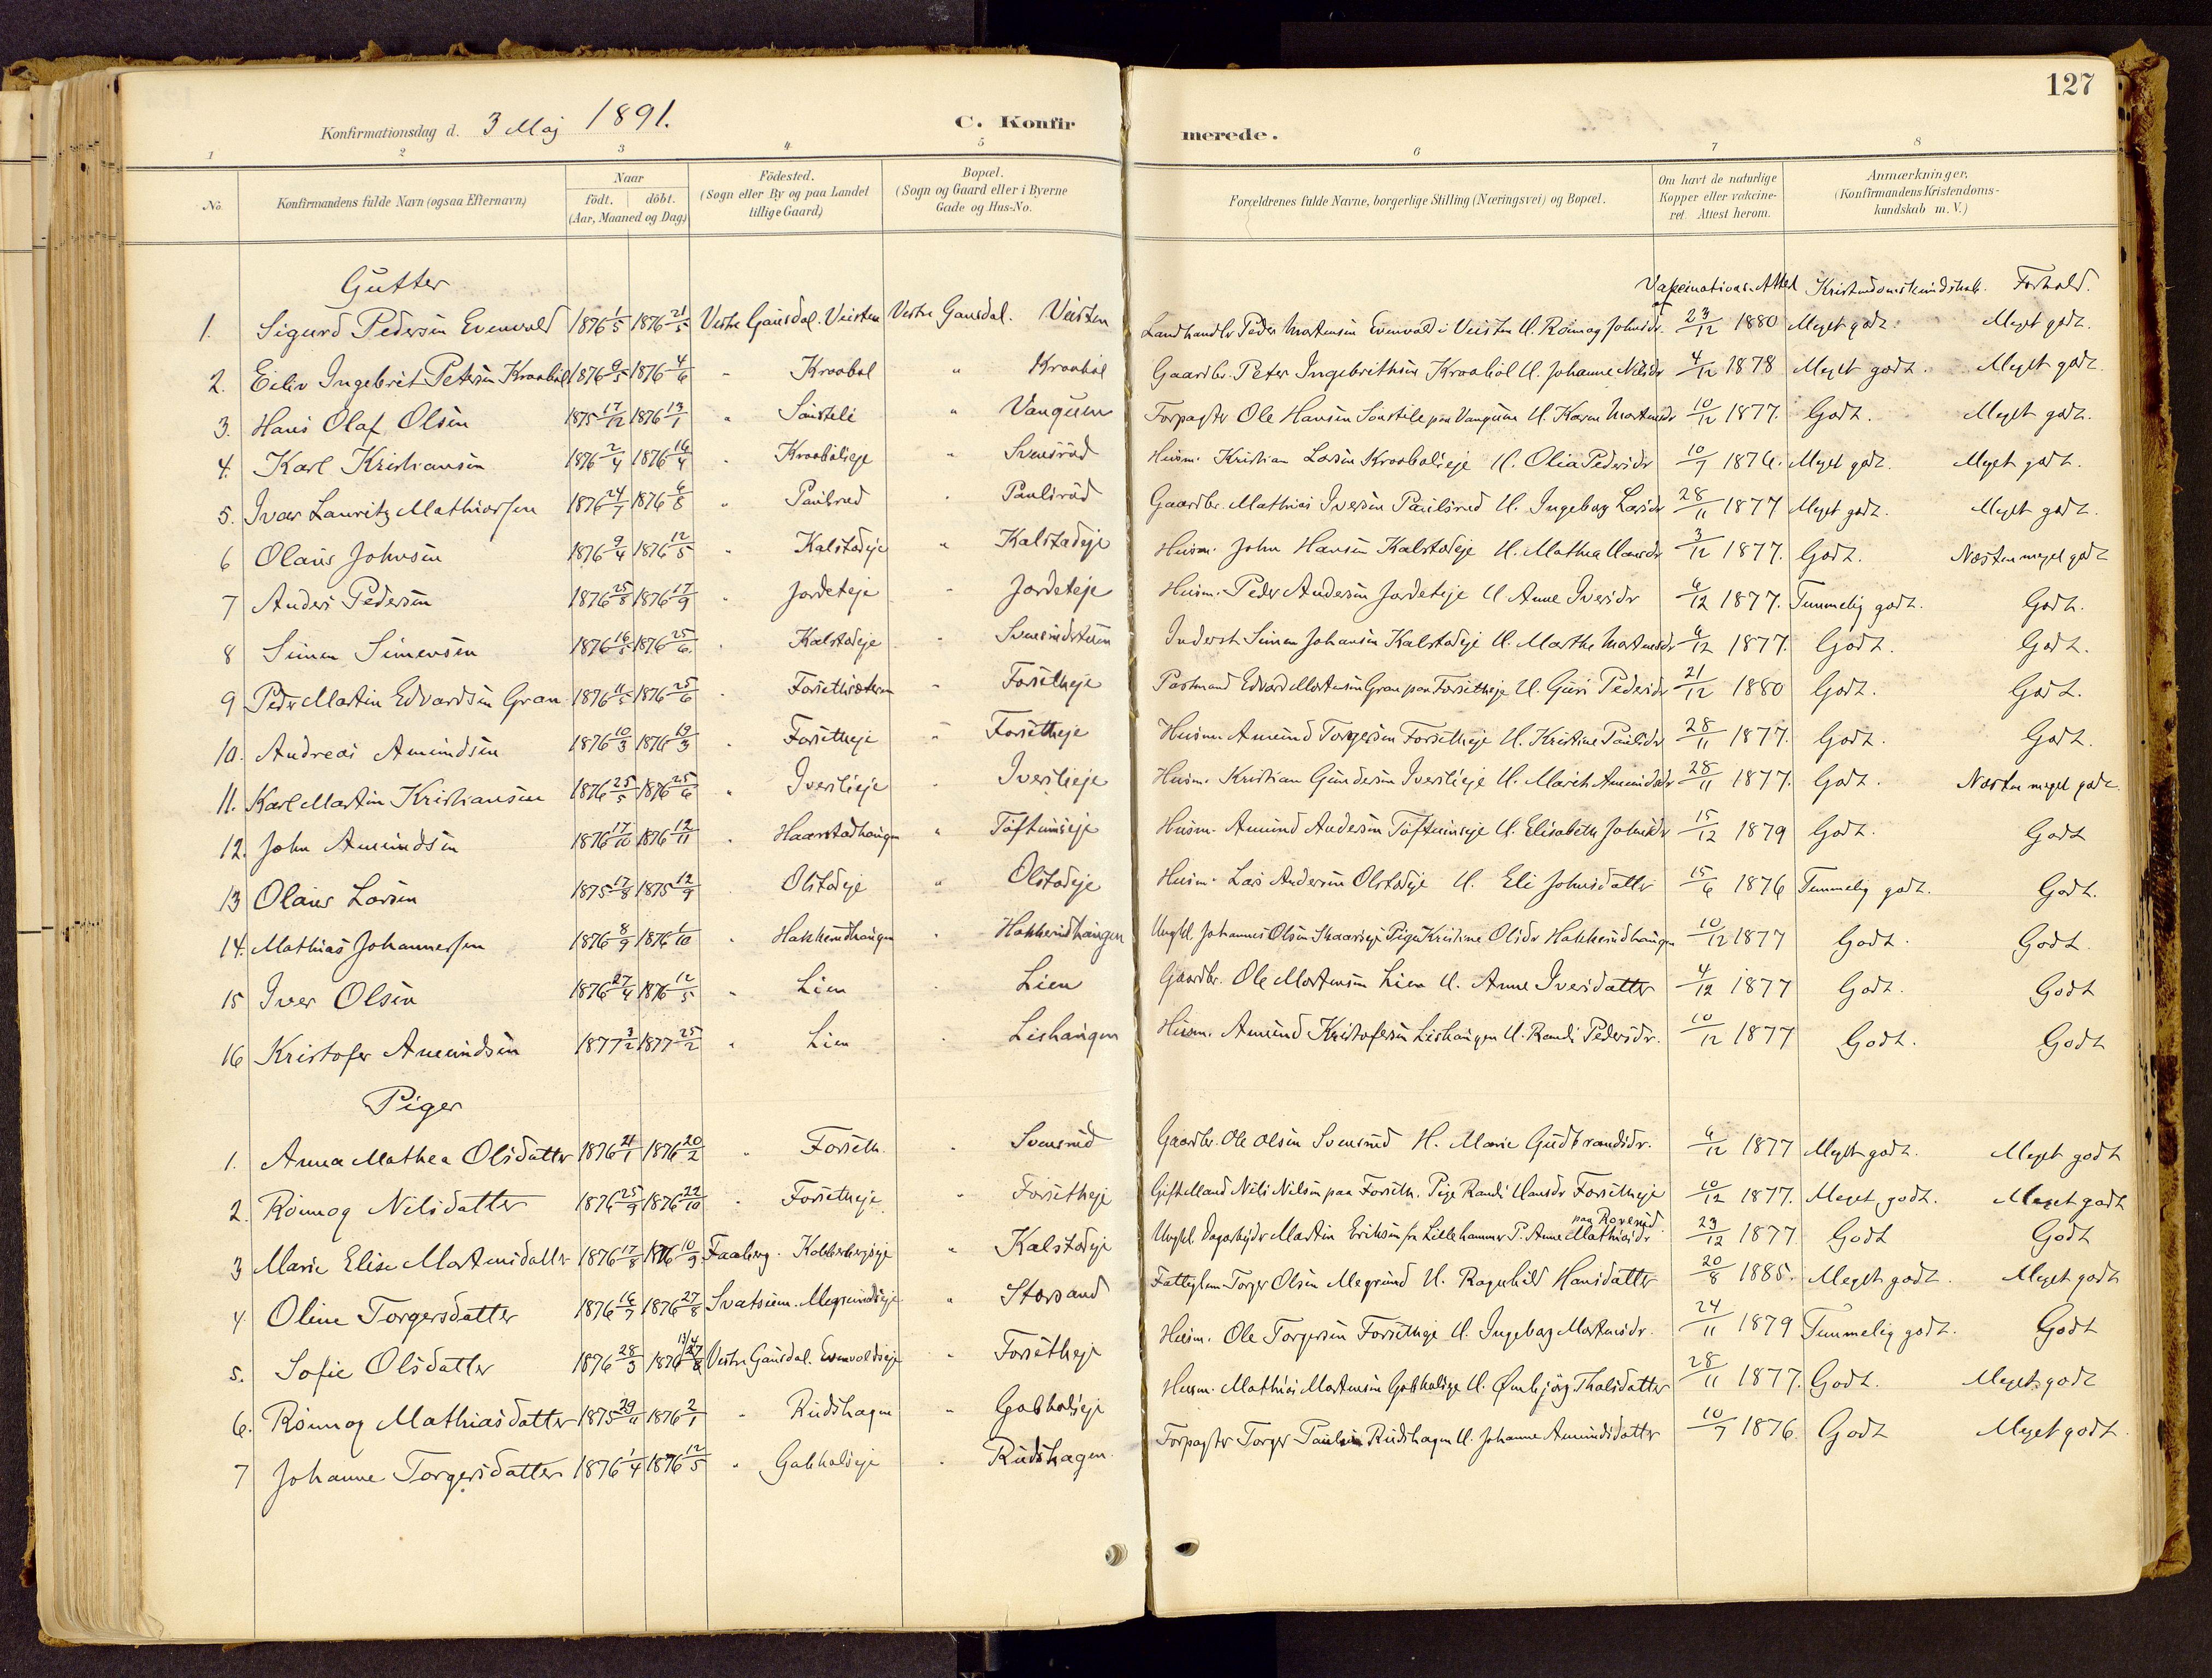 SAH, Vestre Gausdal prestekontor, Ministerialbok nr. 1, 1887-1914, s. 127